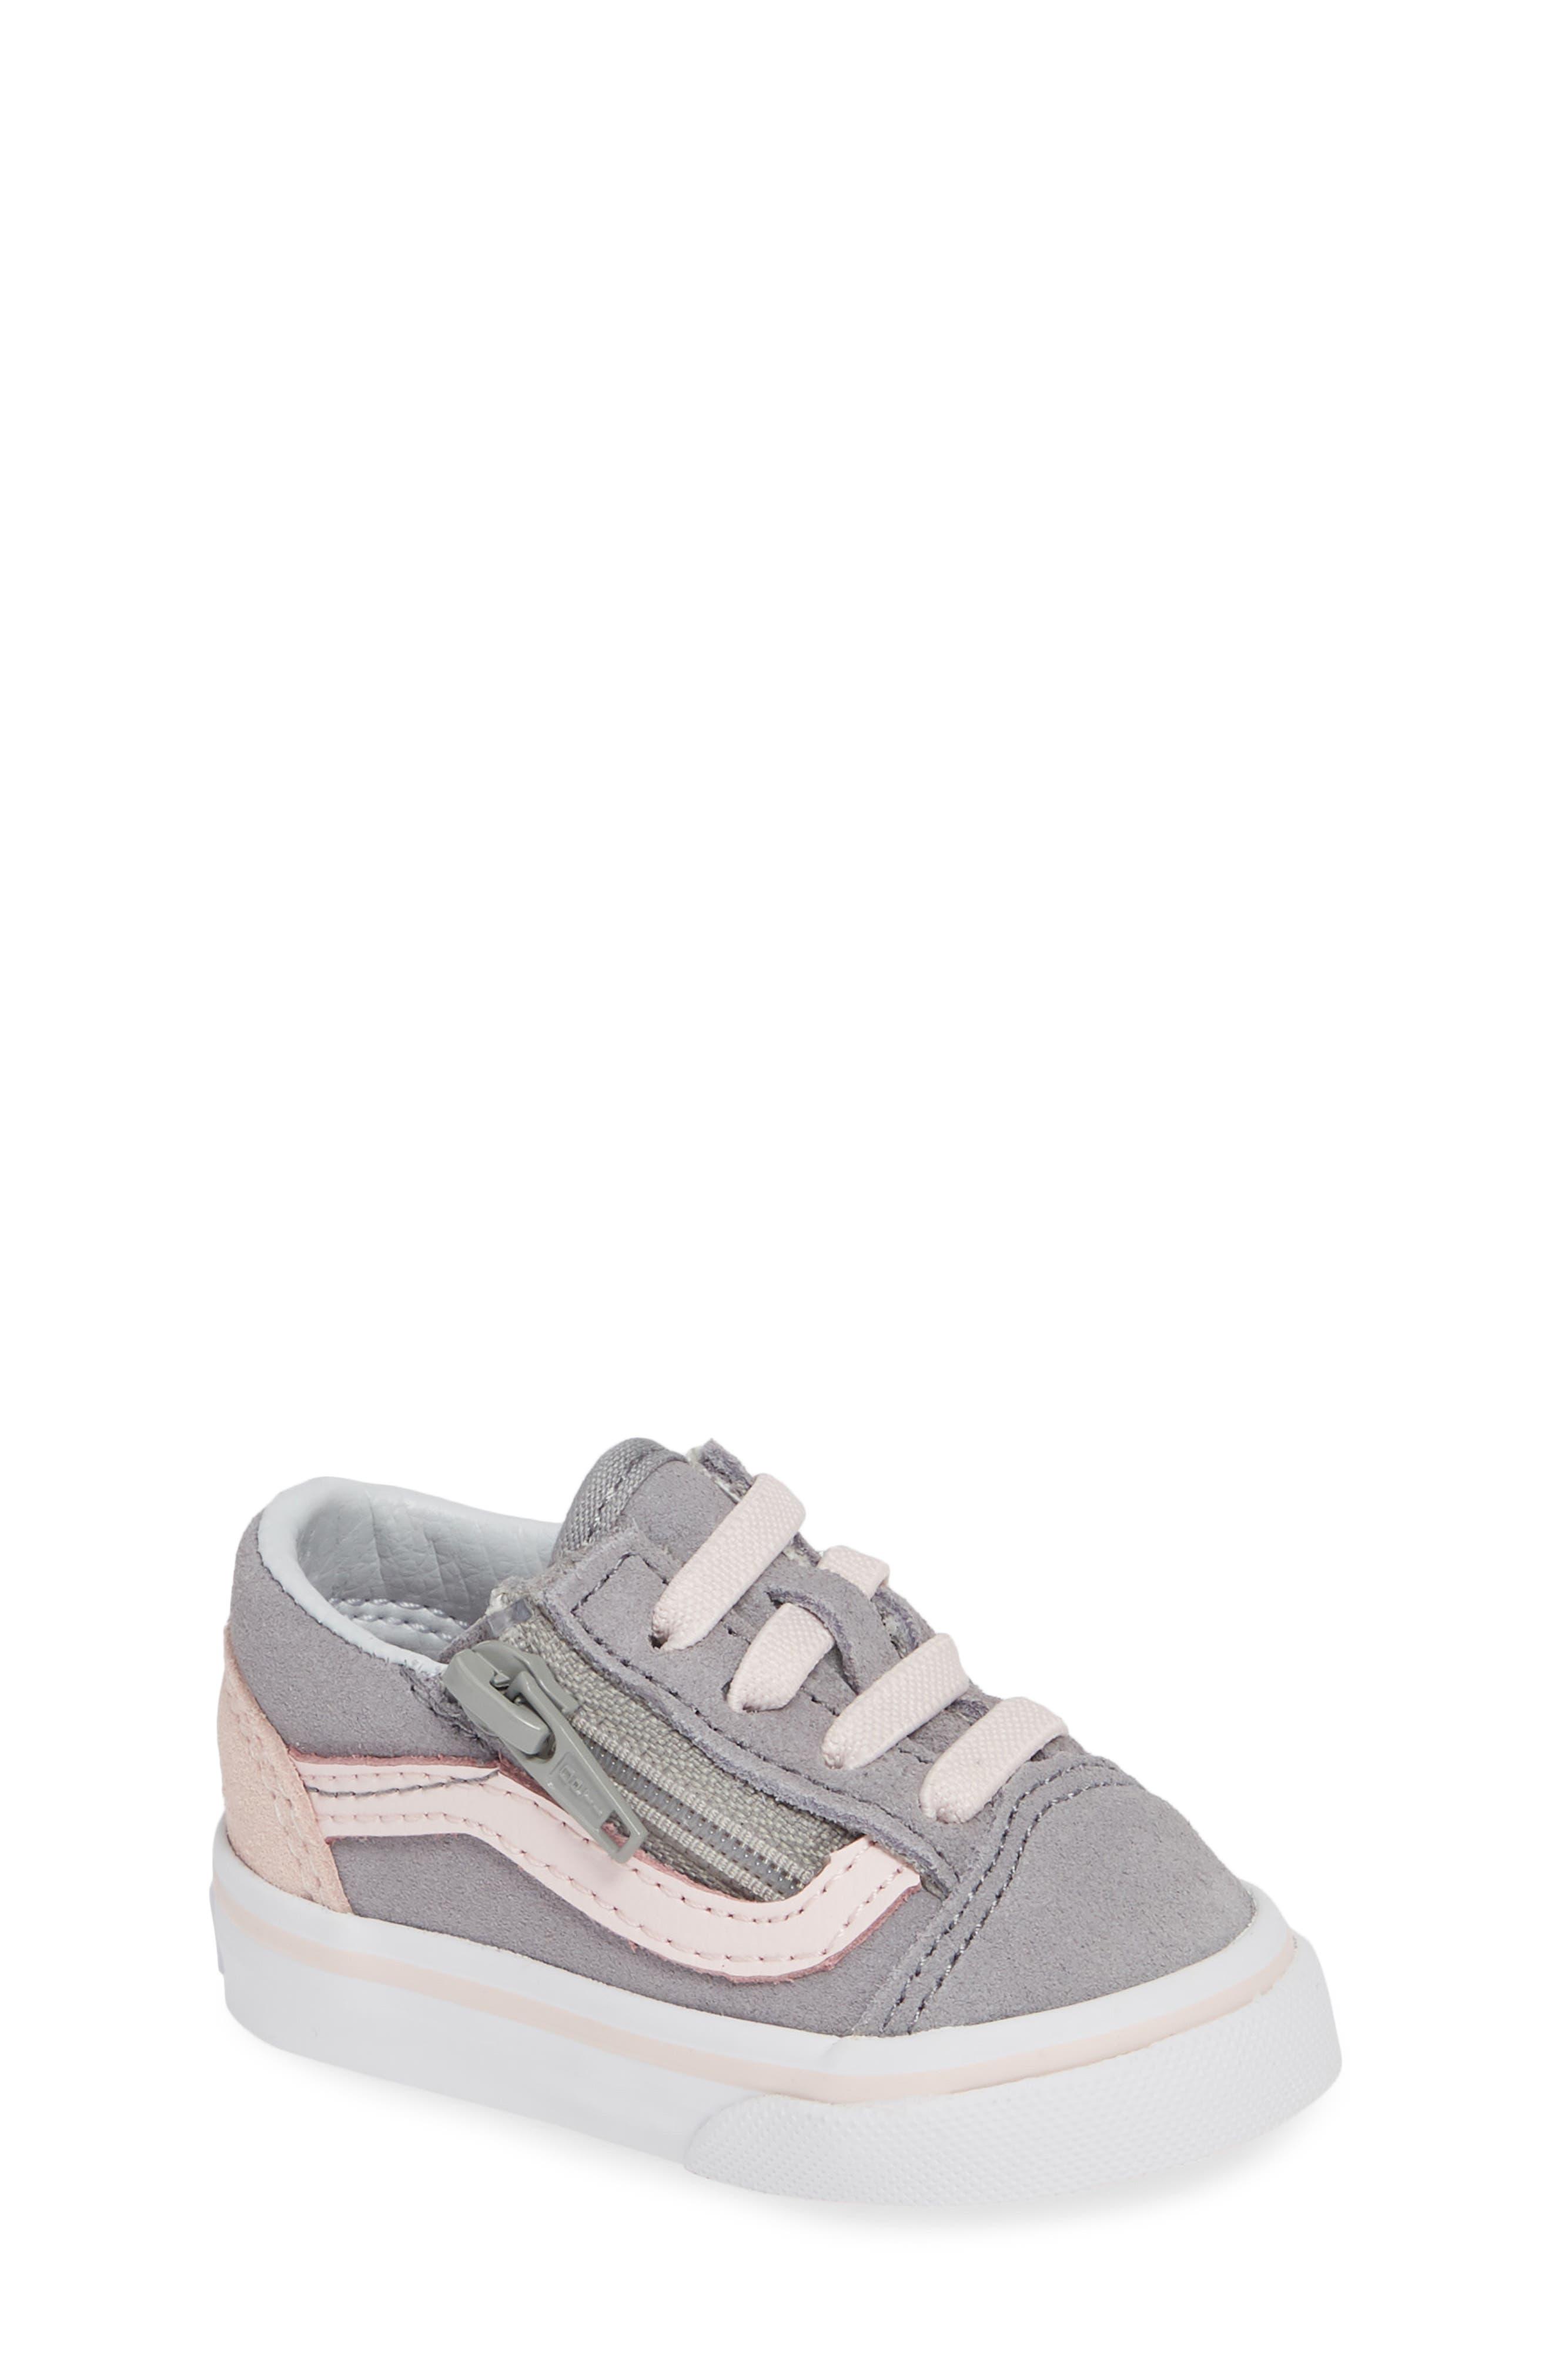 Old Skool Zip Sneaker,                             Main thumbnail 1, color,                             SUEDE ALLOY/ PINK/ TRUE WHITE